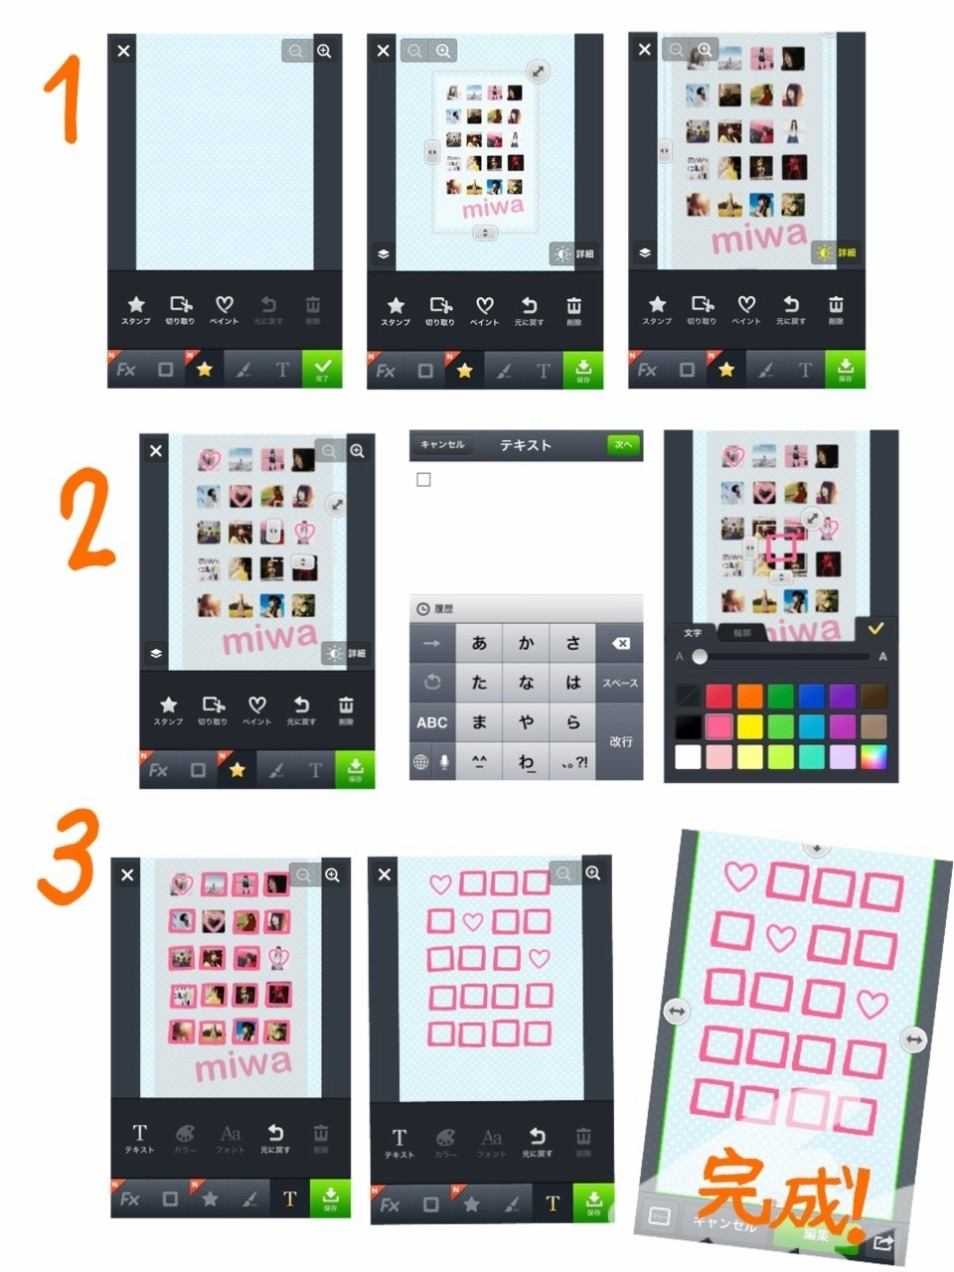 Iphone用壁紙作り方 26754034 完全無料画像検索のプリ画像 Bygmo